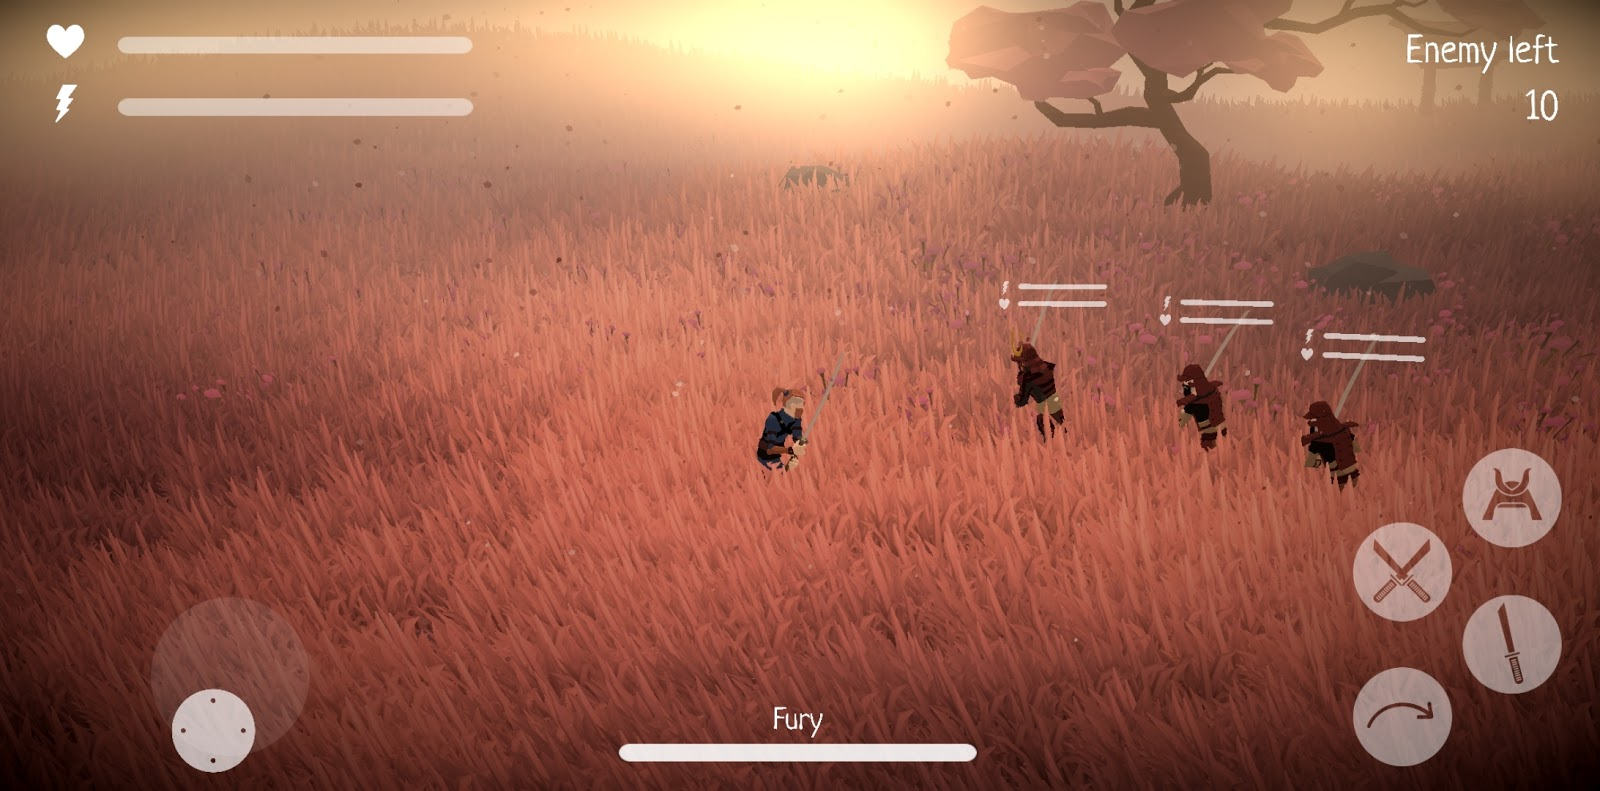 Glory ages samurais review, info game terbaru, game android terbaru, game android paling seru, game android, kabar game hari ini, kabar game terbaru,